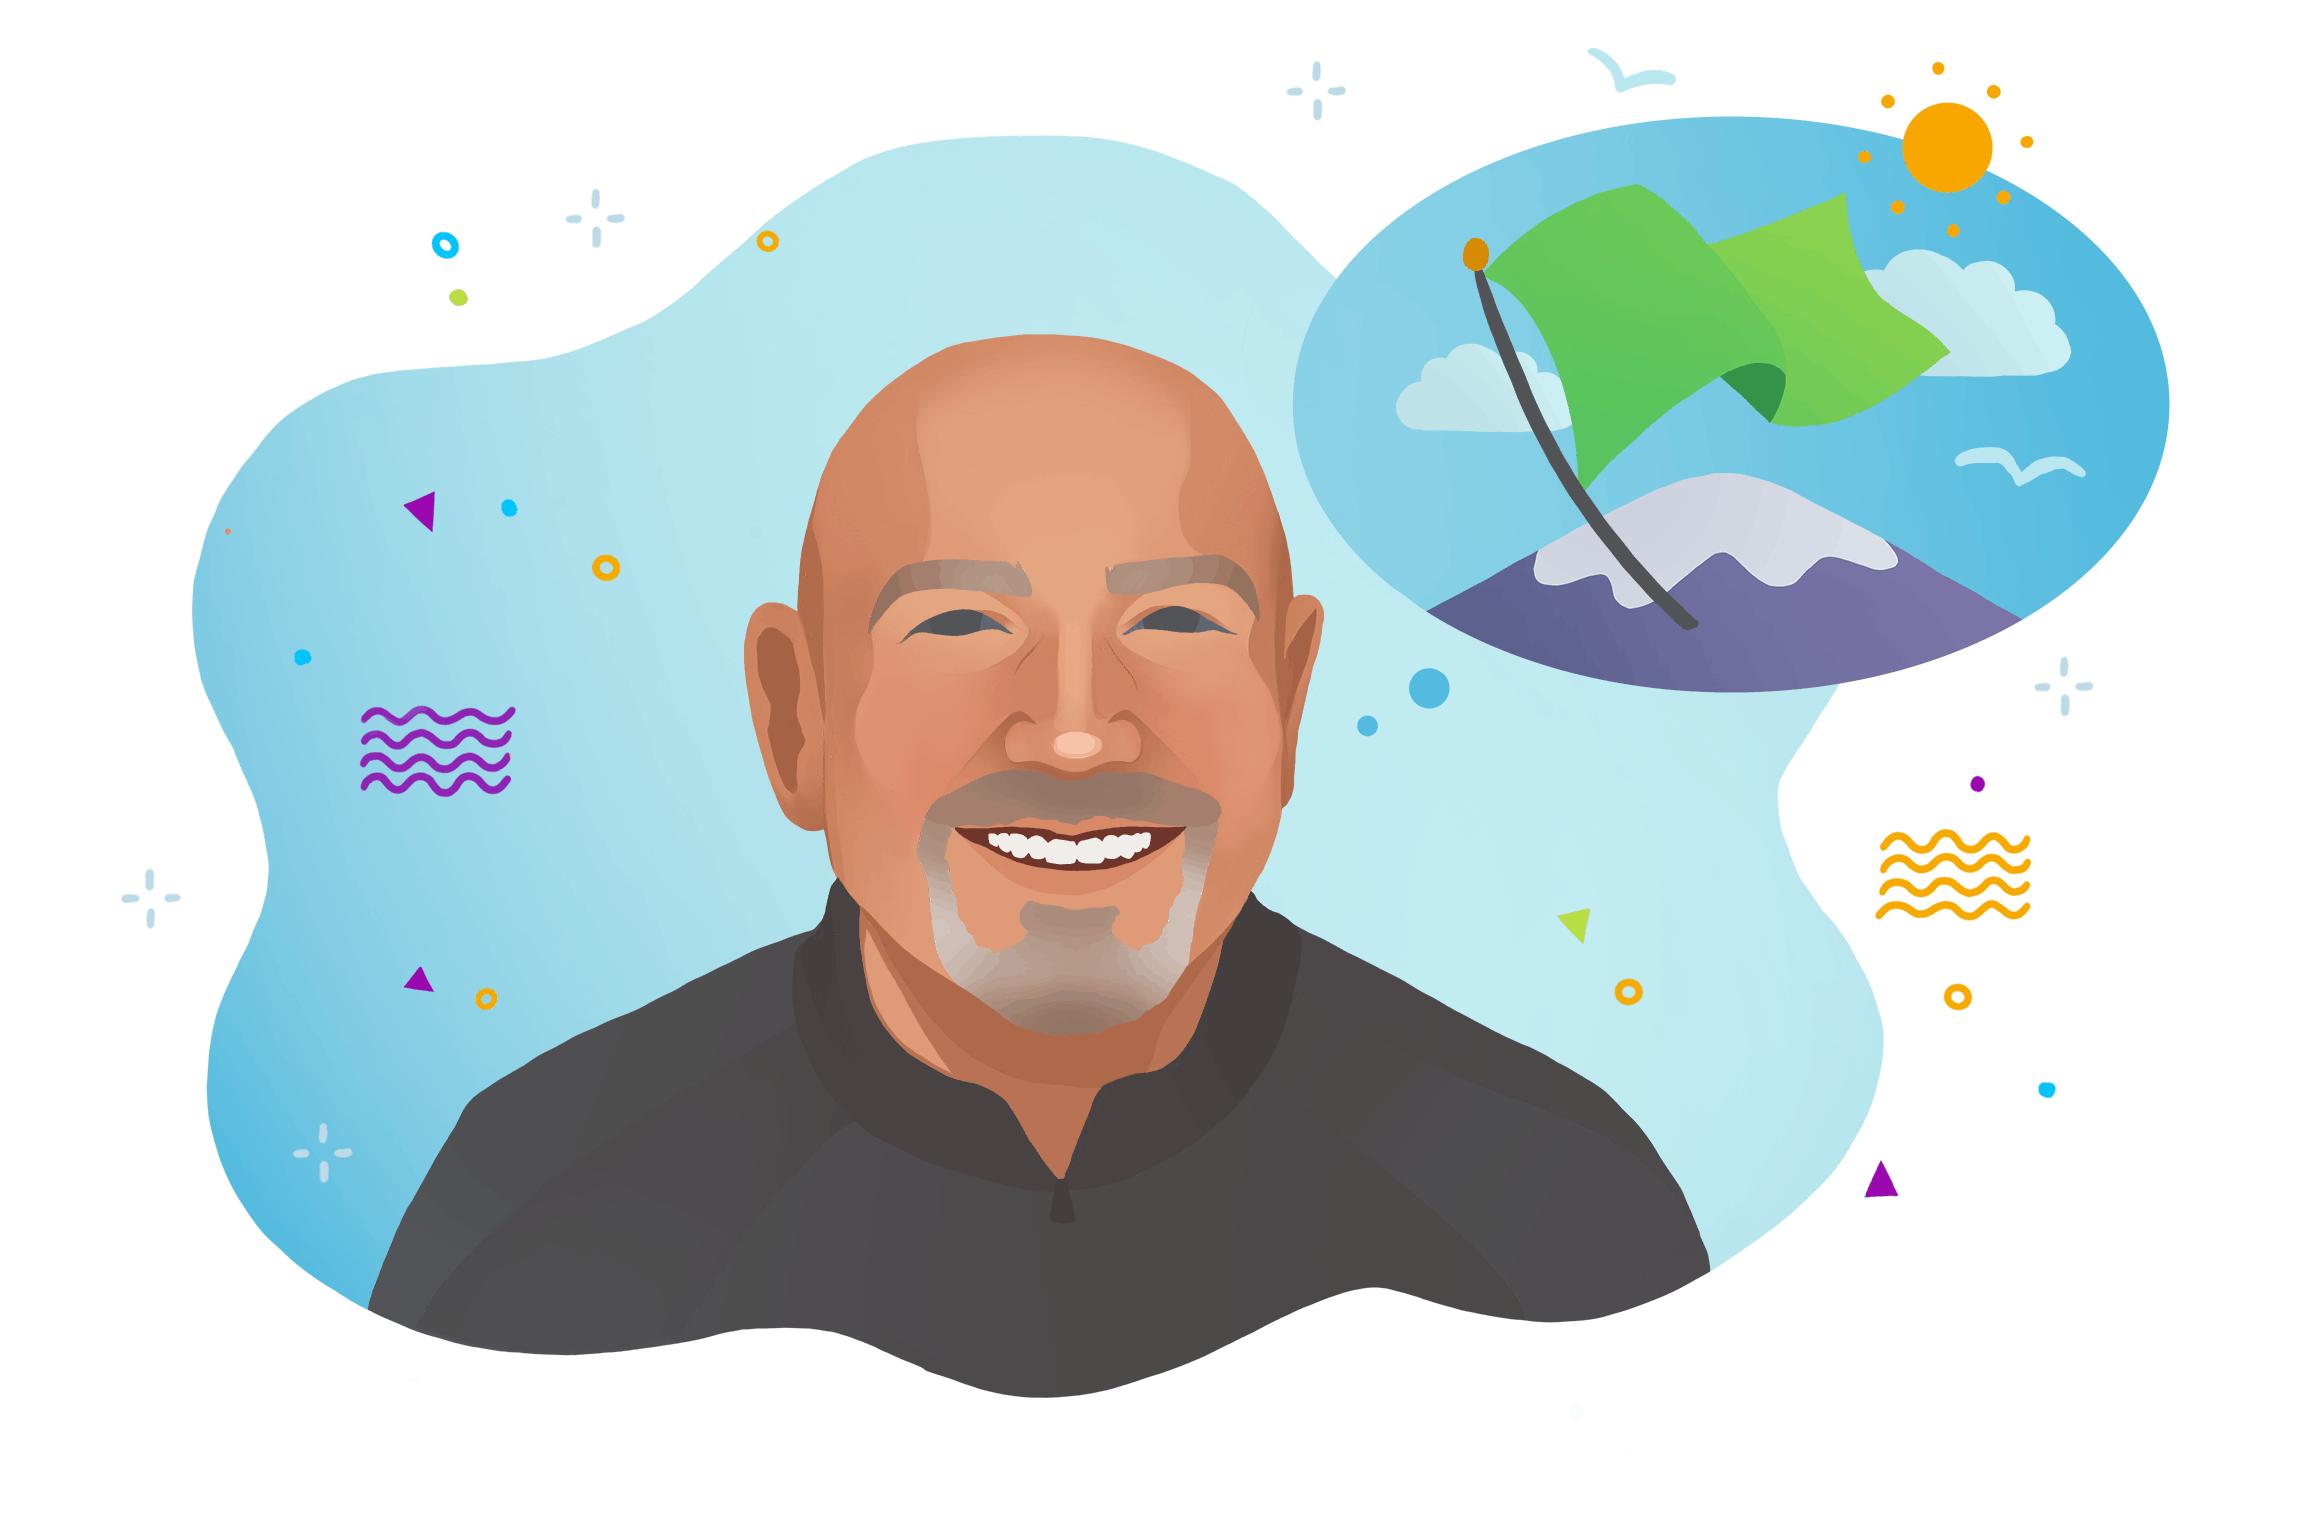 A cartoon illustration of Chaordix CEO Terry Sydoryk.